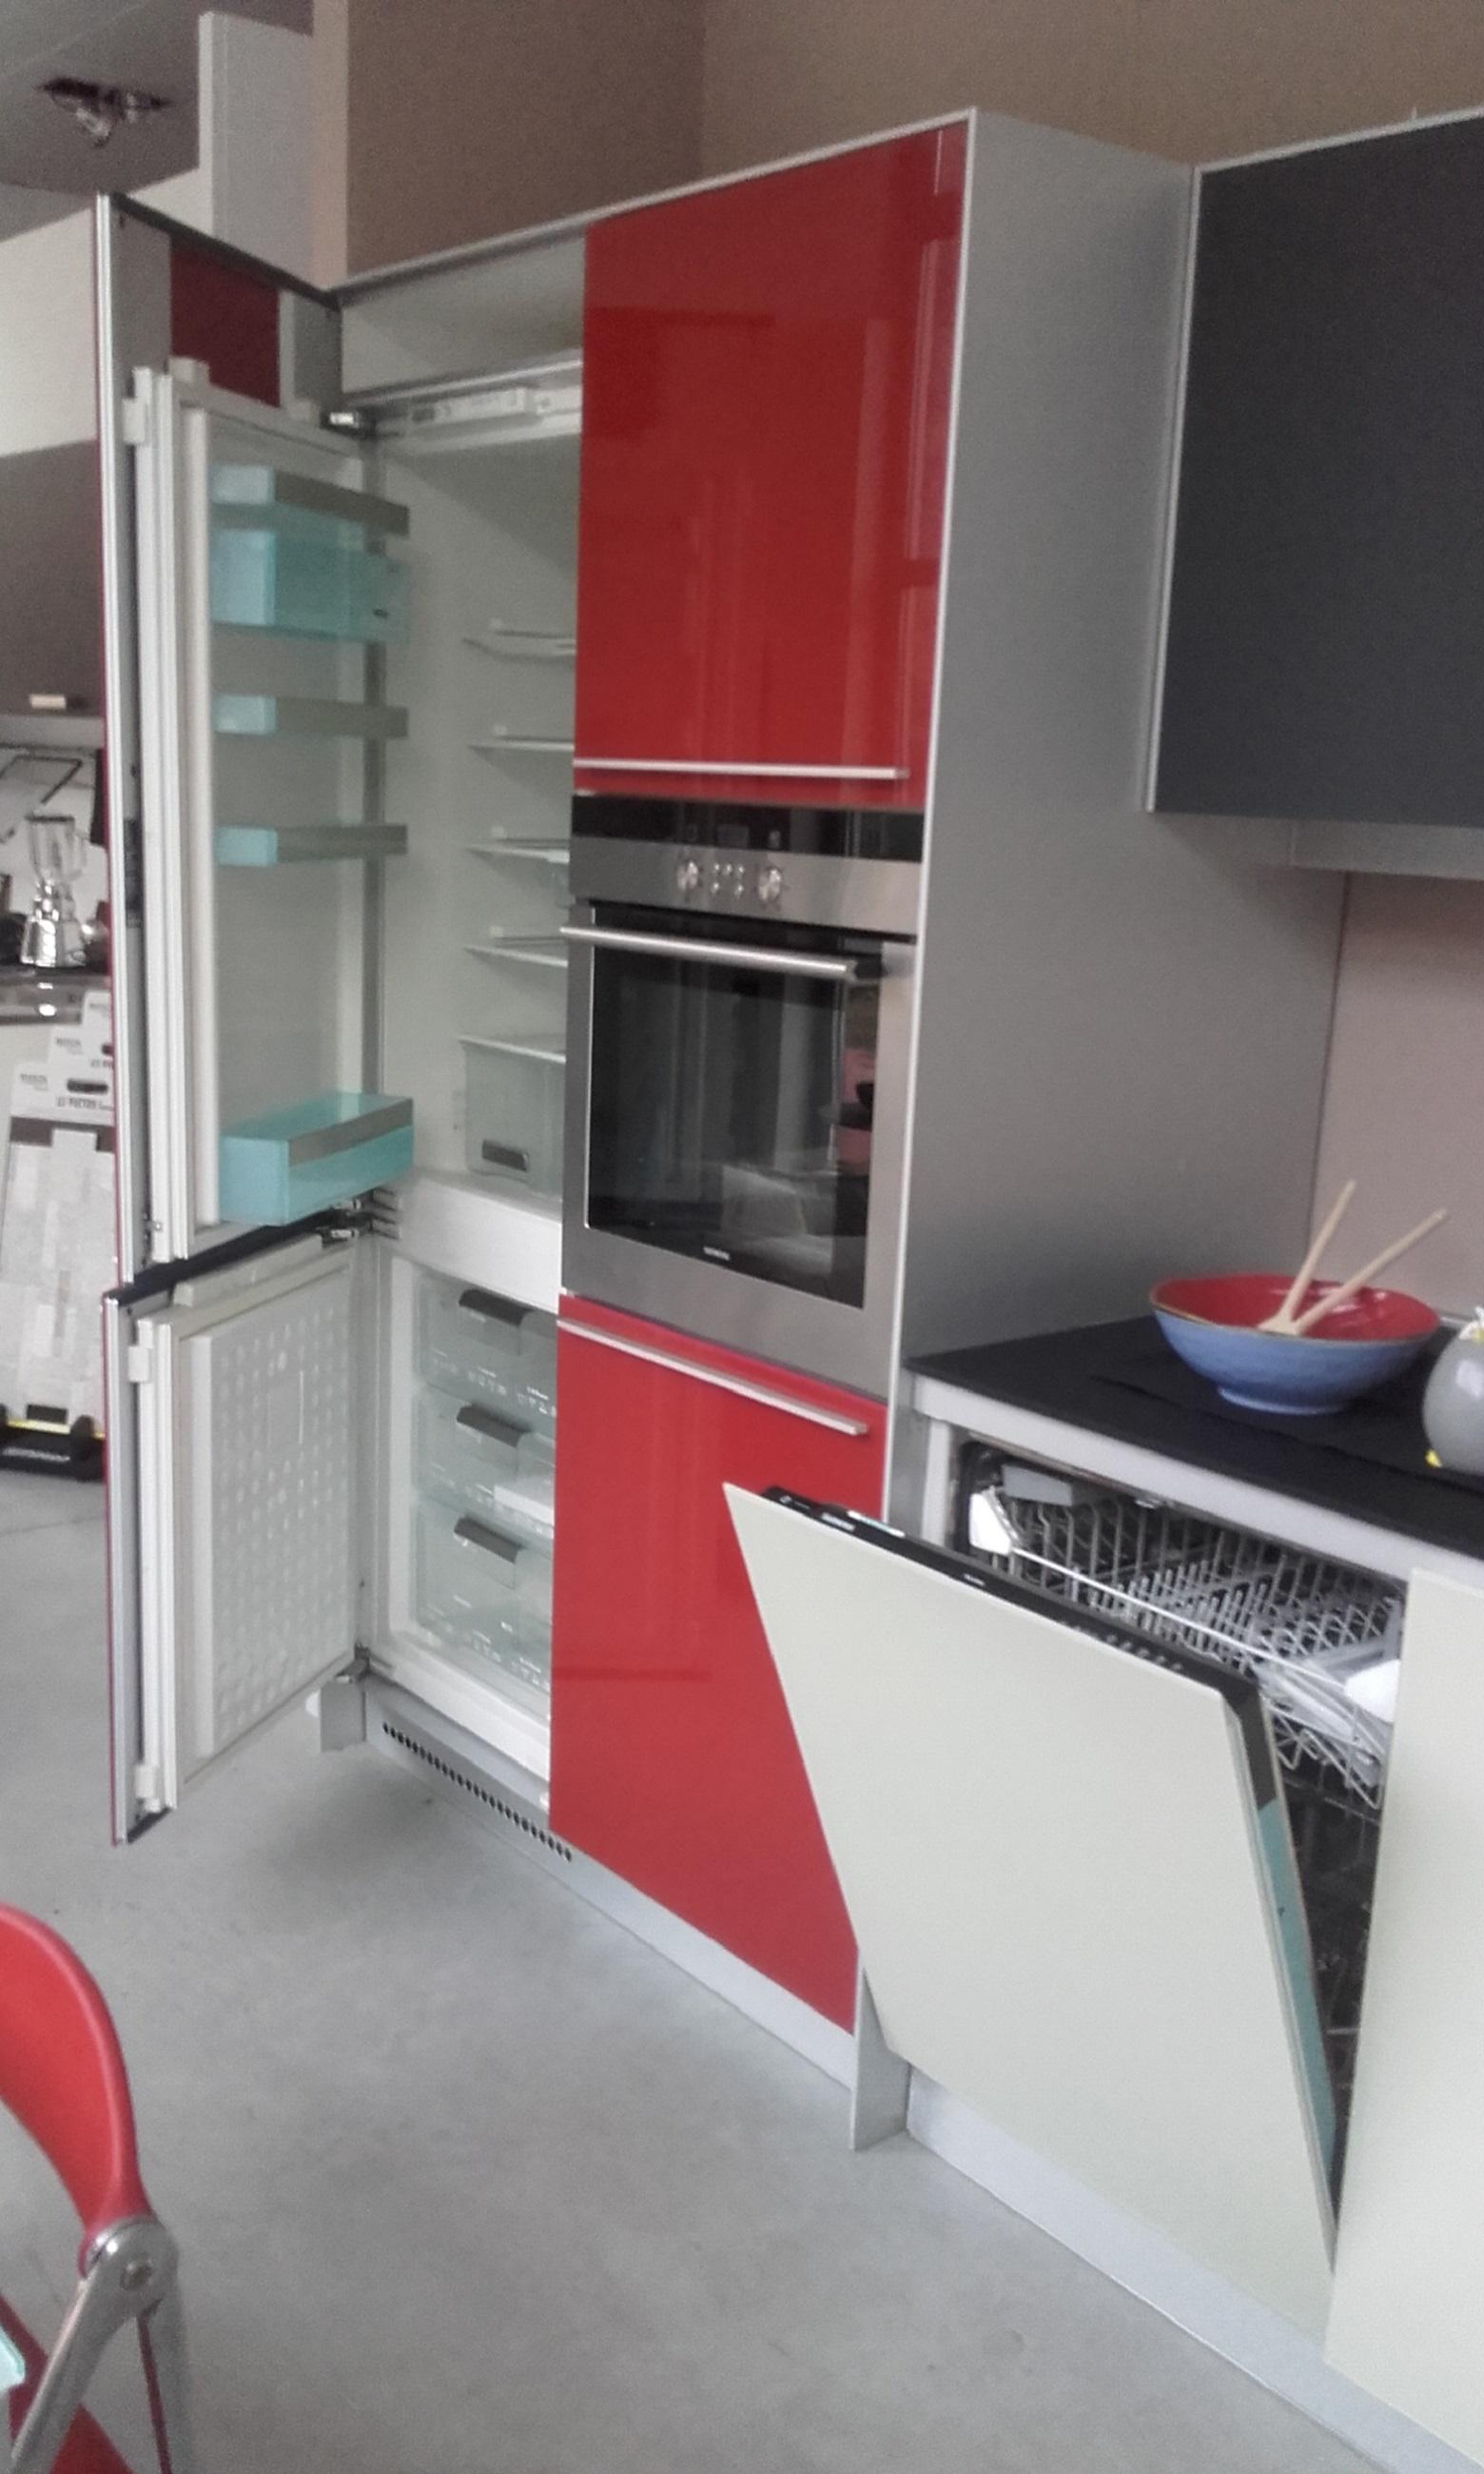 Cucine Valcucine Opinioni - Idee Per La Casa - Syafir.com